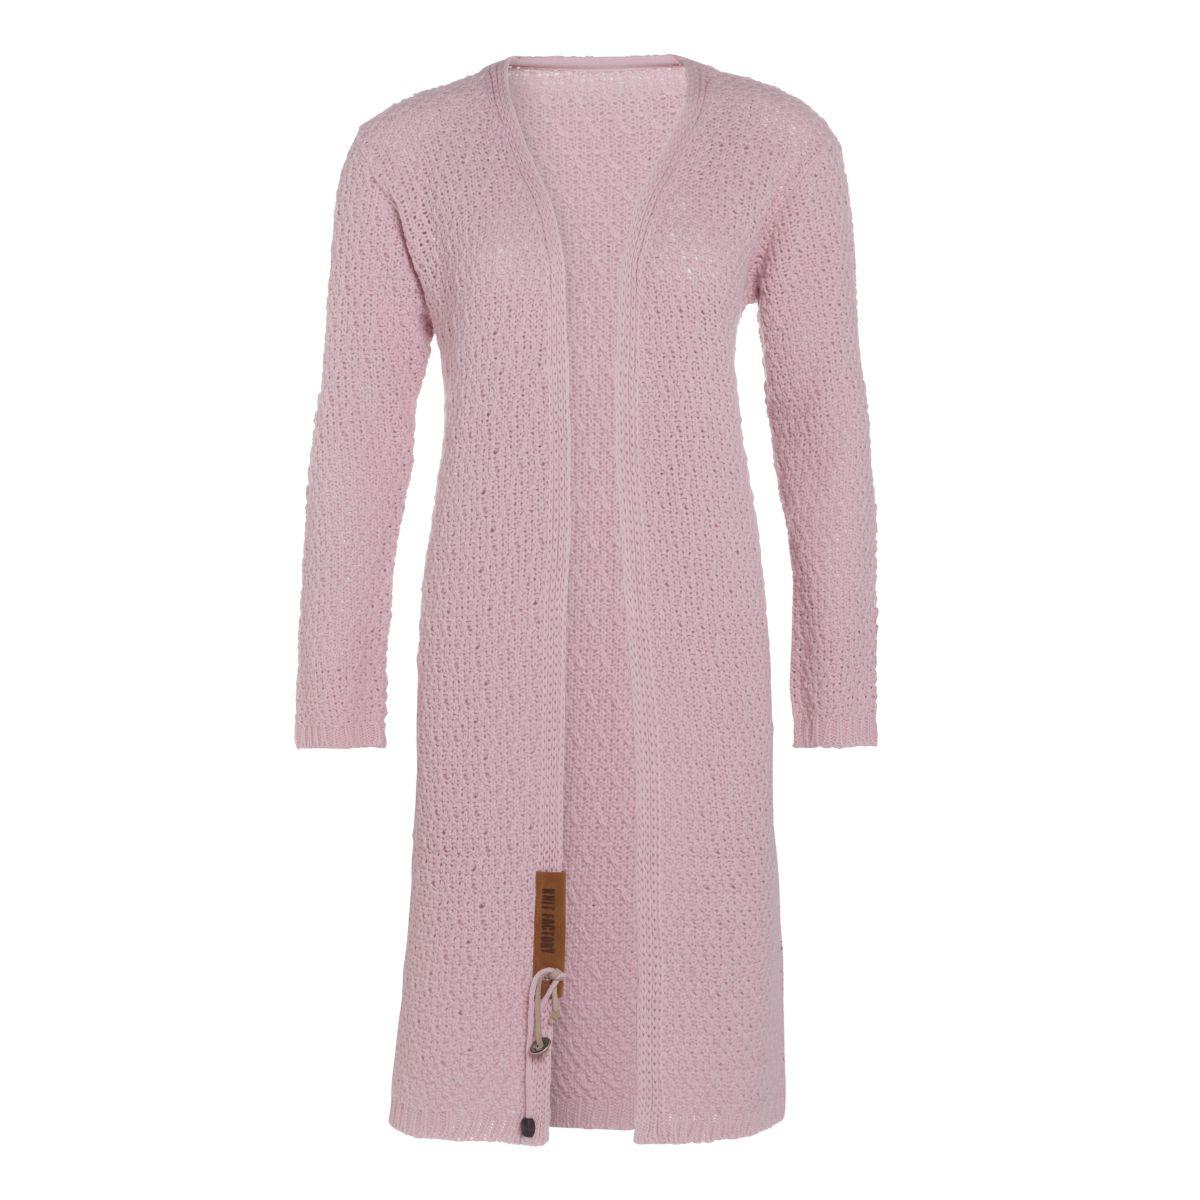 knit factory 1336221 luna vest 3638 roze 1